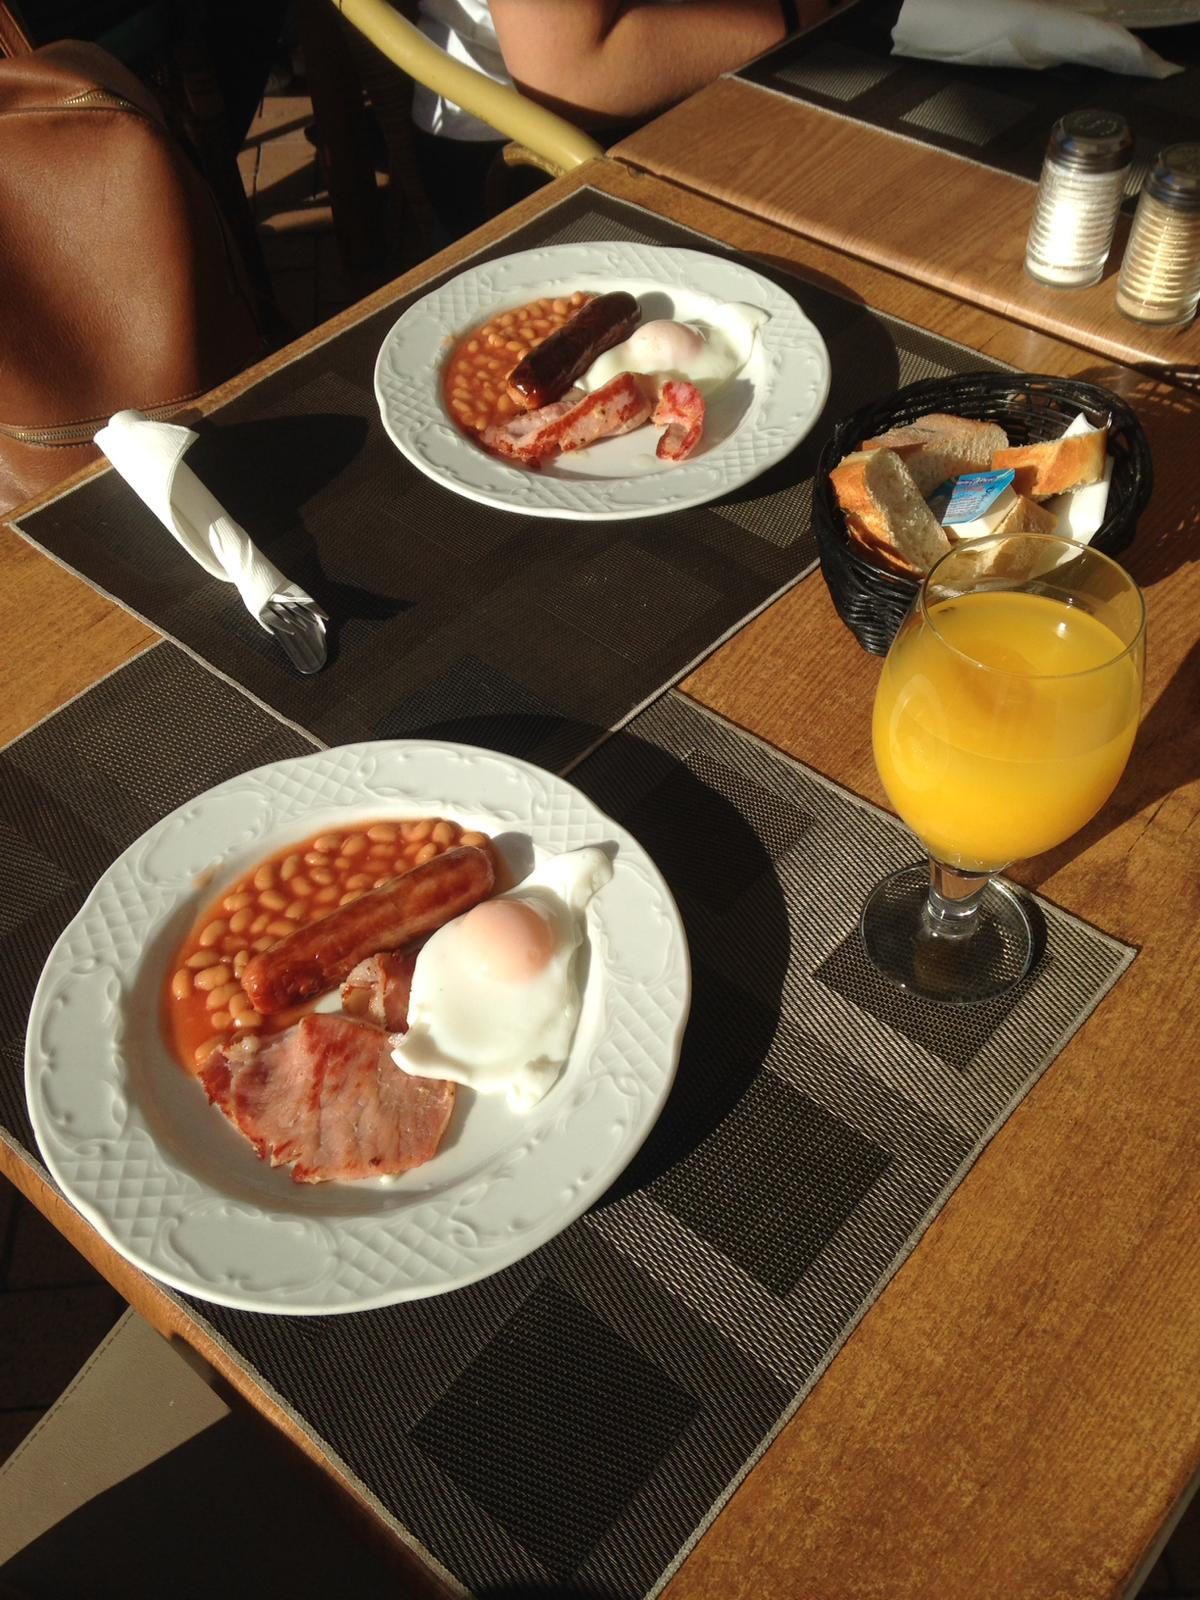 Desayuno ingles (3)